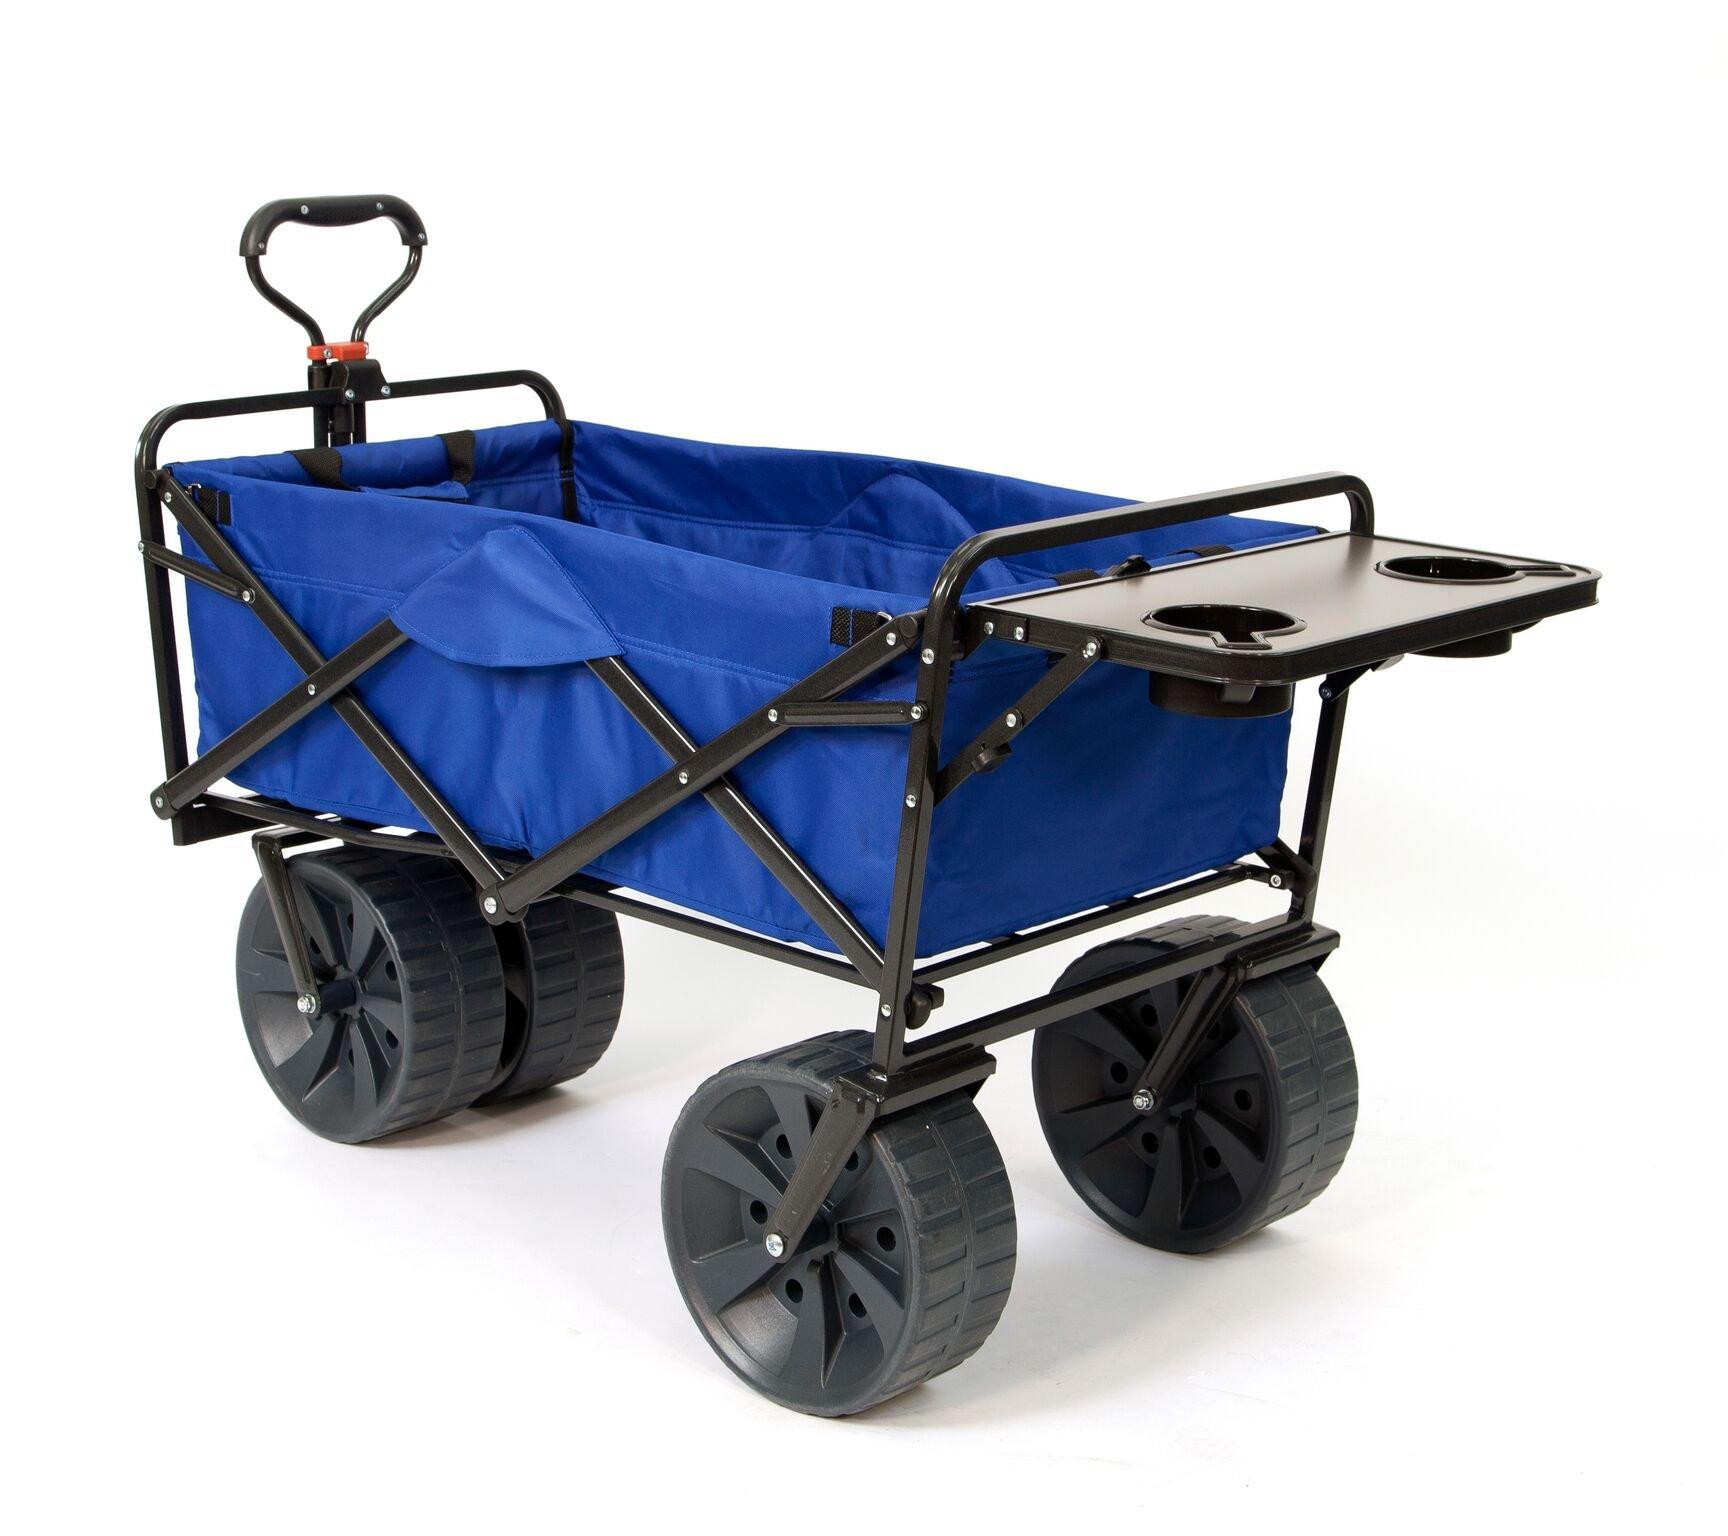 Mac Sports Heavy Duty Collapsible Folding All Terrain Utility Wagon Beach Cart (Blue/Black with Table)